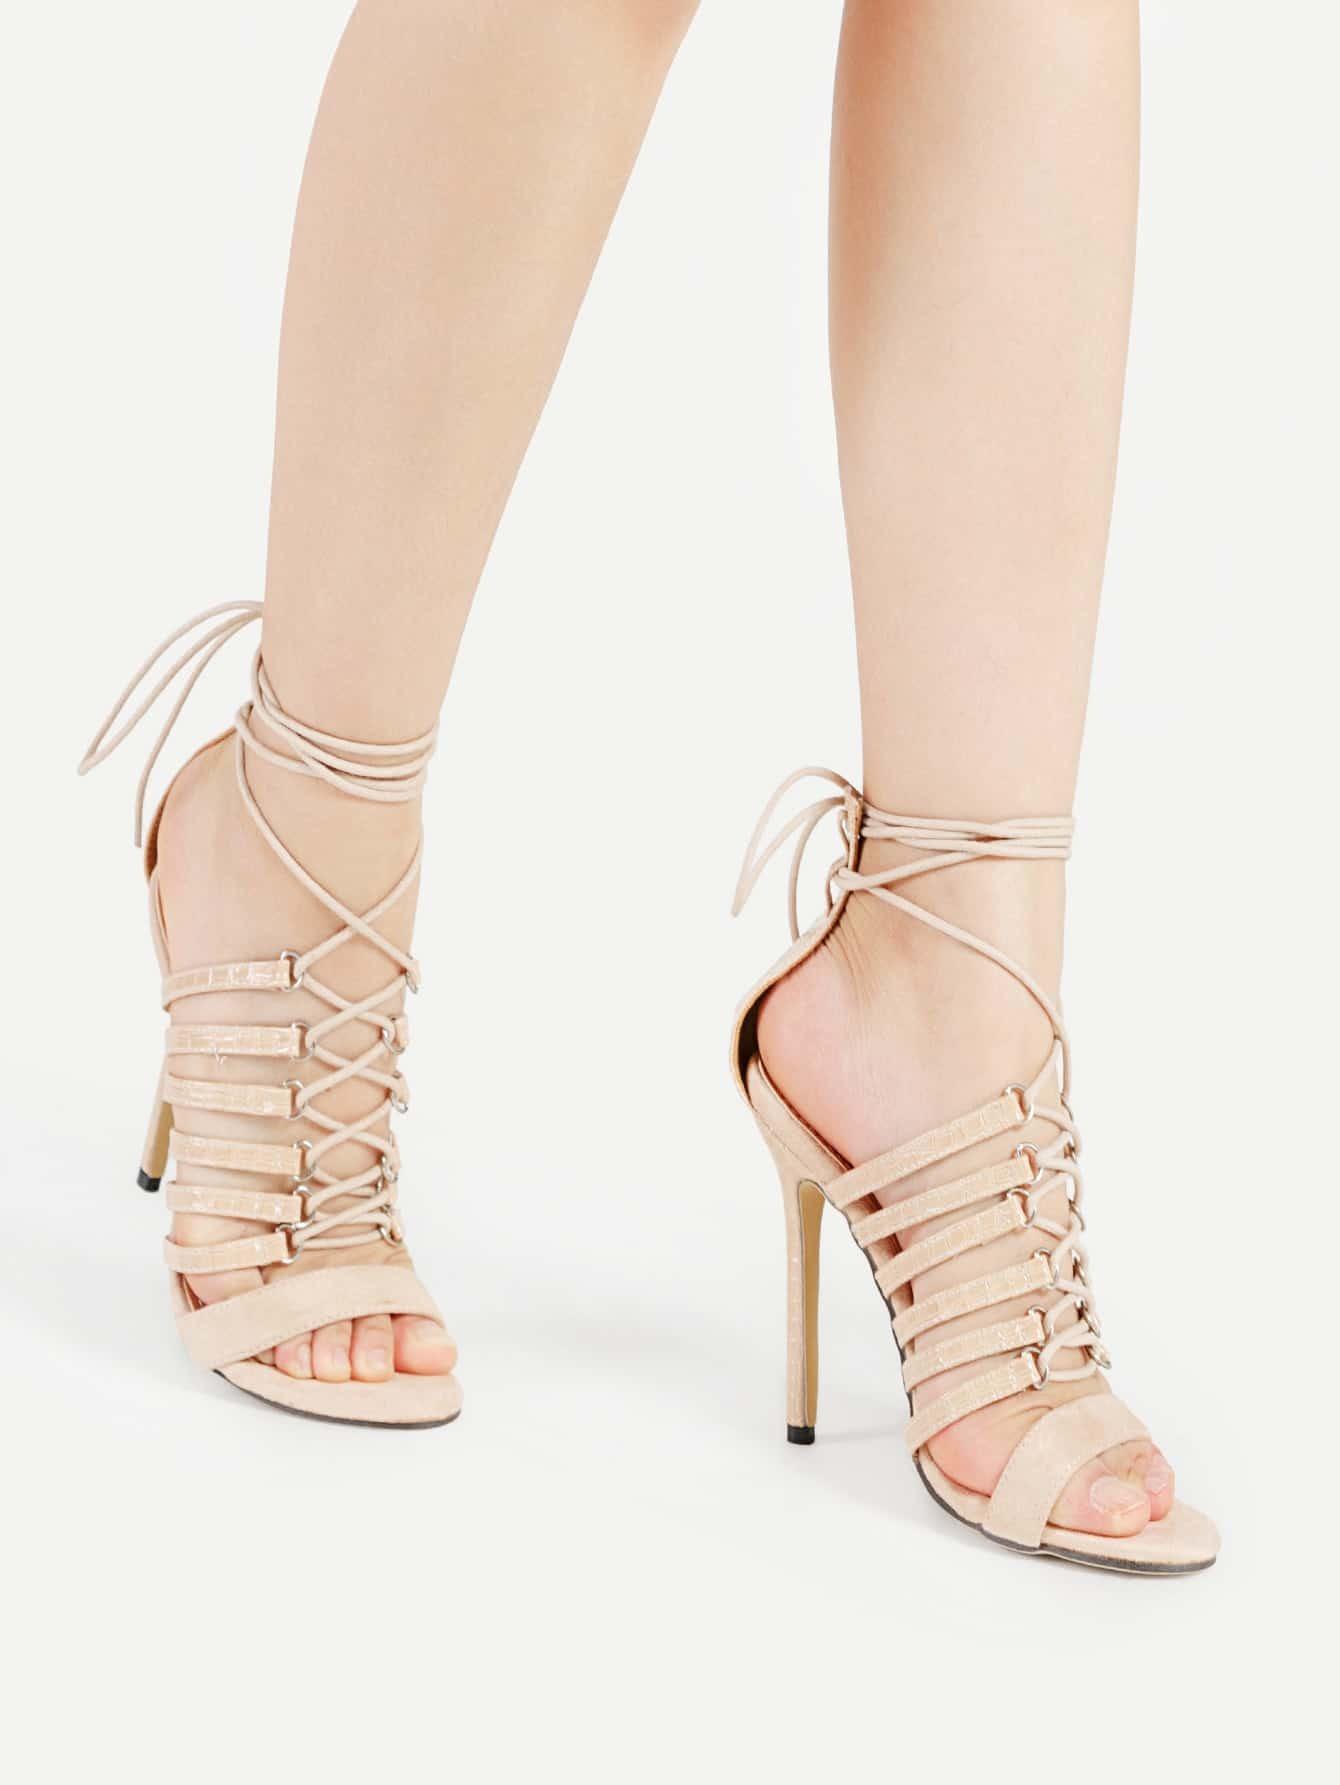 Criss Cross Tie Up PU Stiletto Sandals